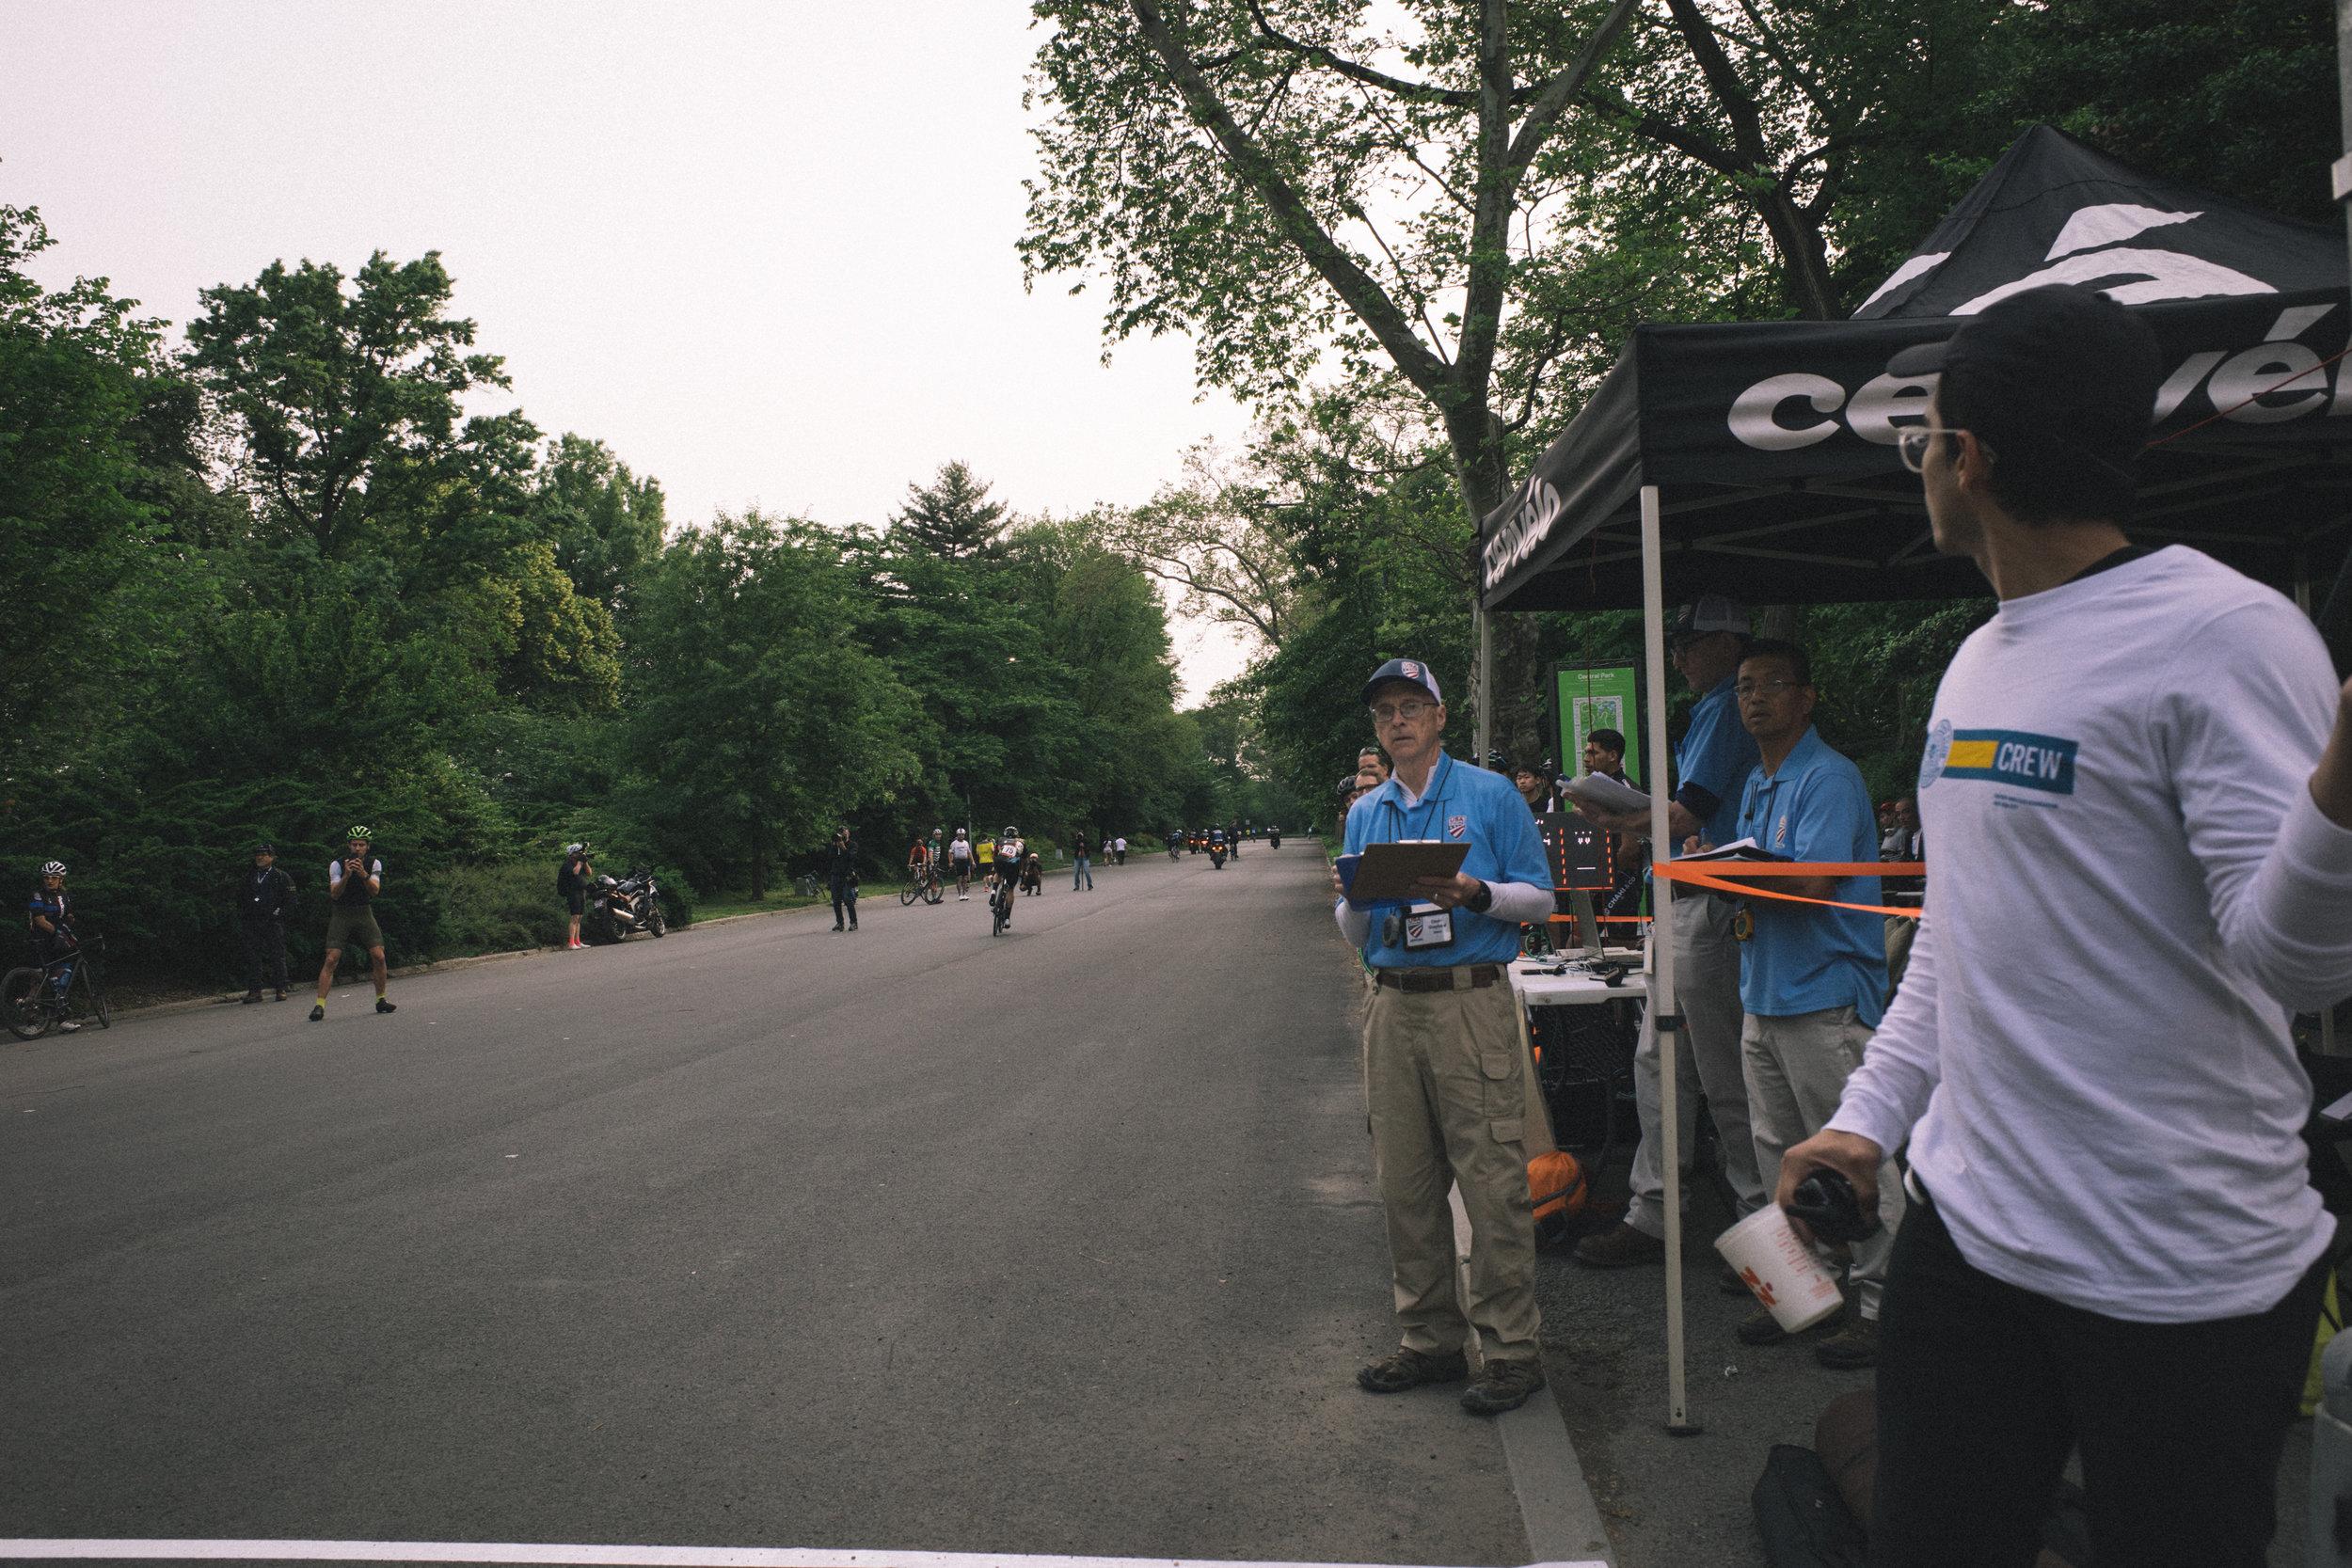 Photo Rhetoric - To Be Determined - Dave Jordan Central Park Classic-5052.jpg